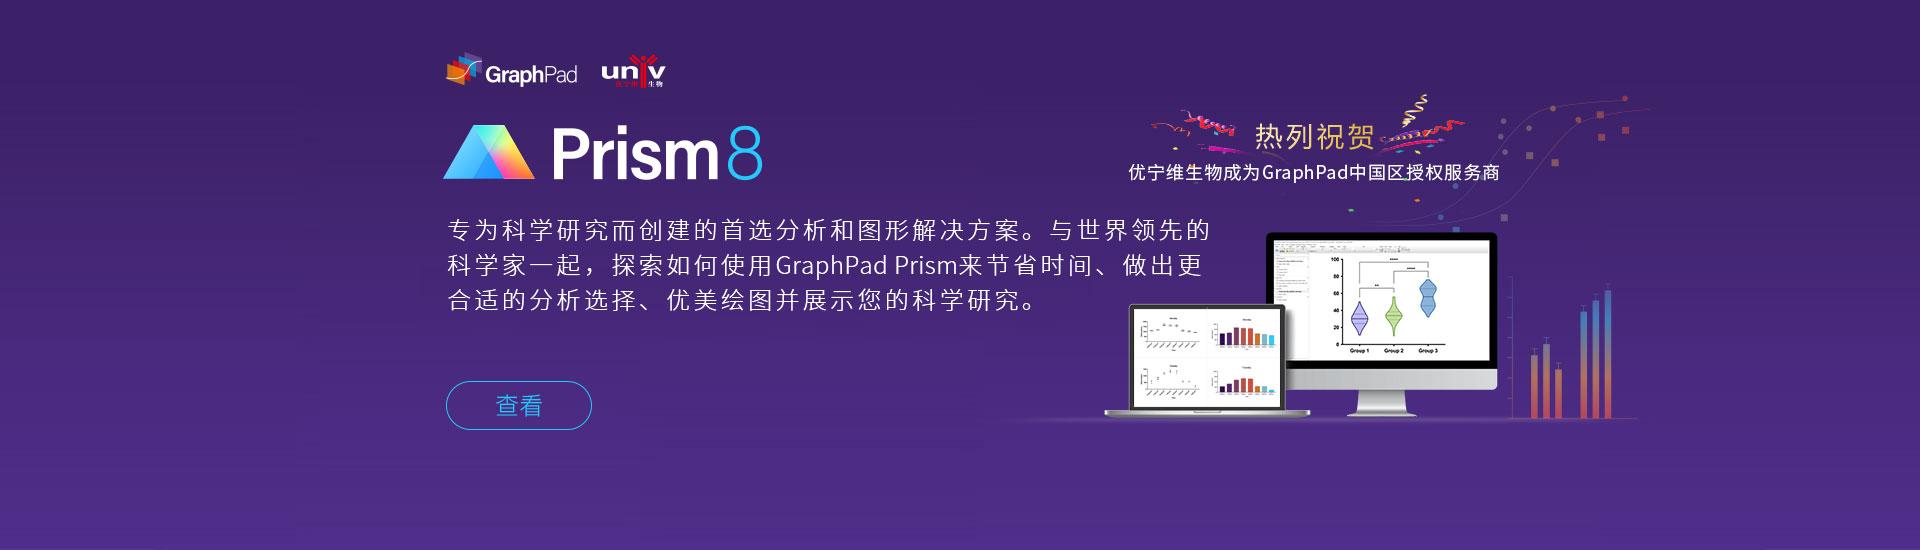 GraphPad广告图